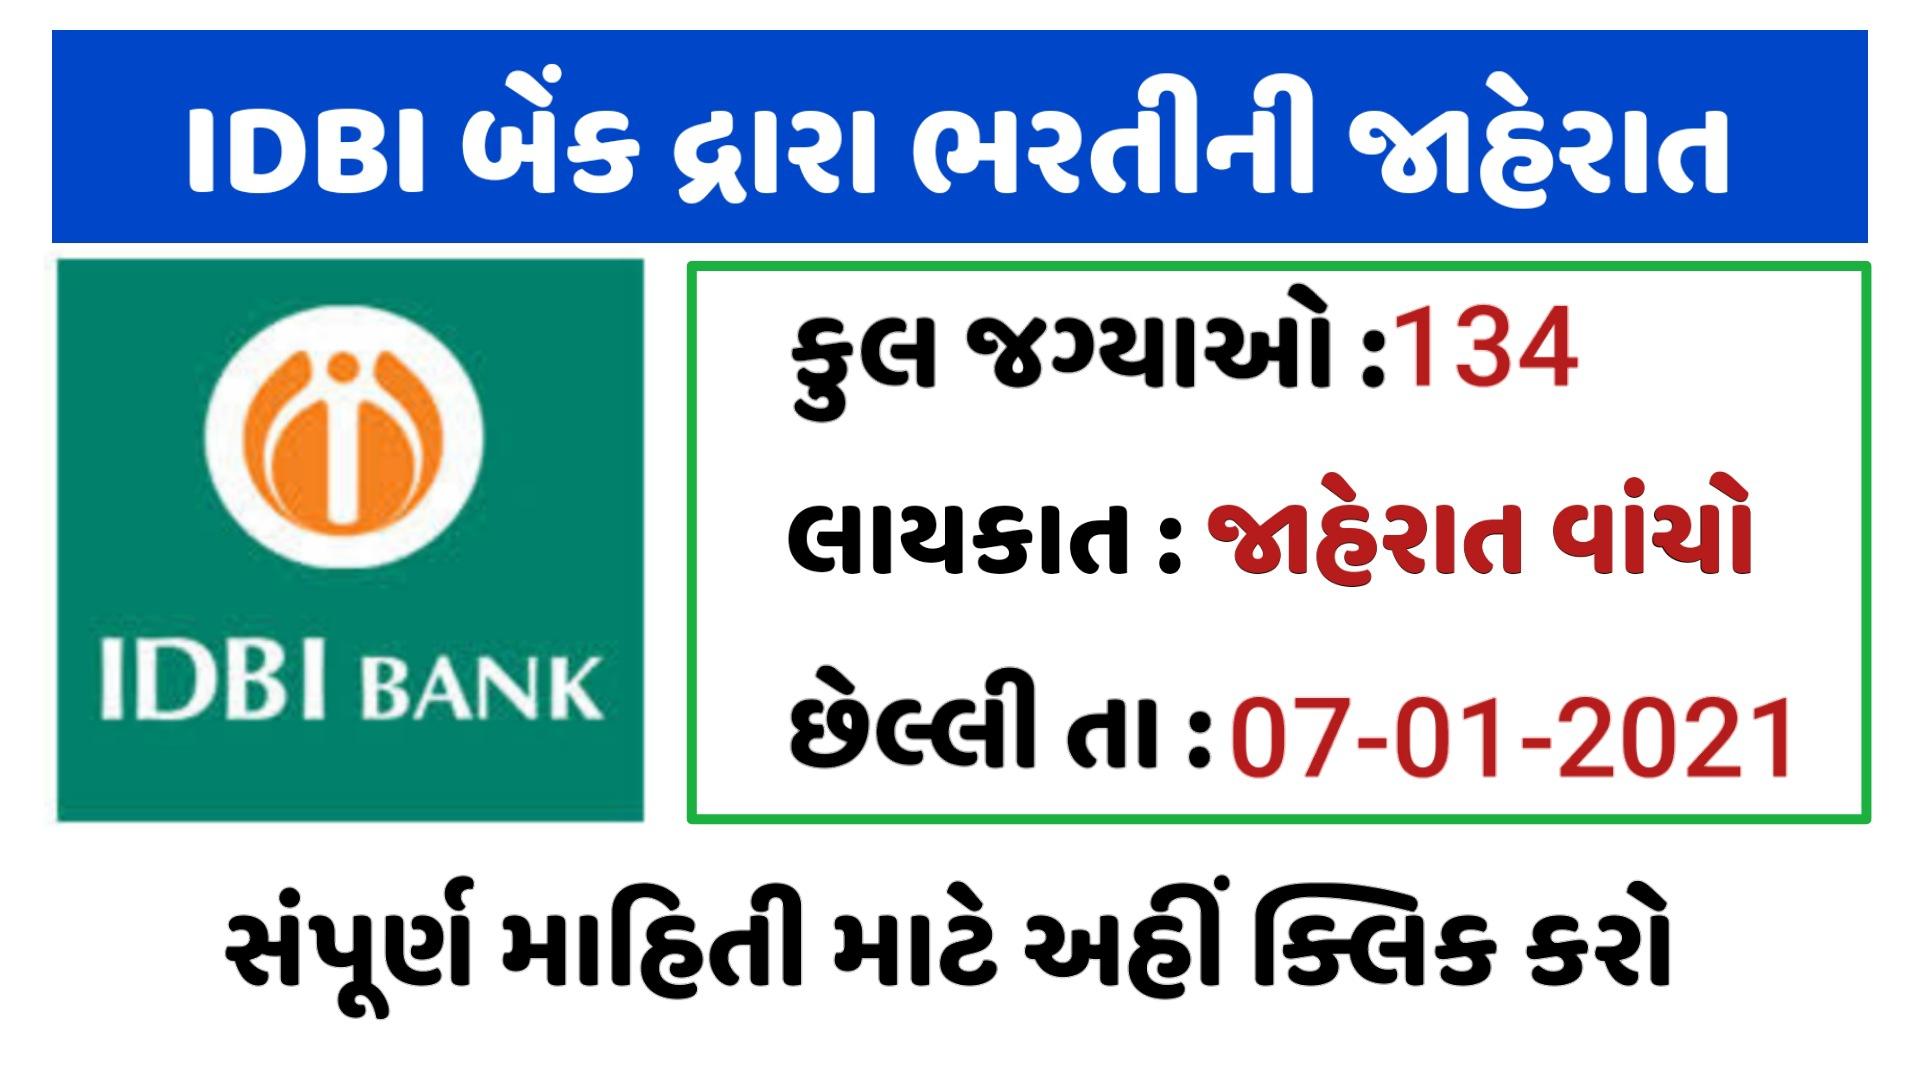 IDBI Bank By Recruitment & Apply online 2020-21